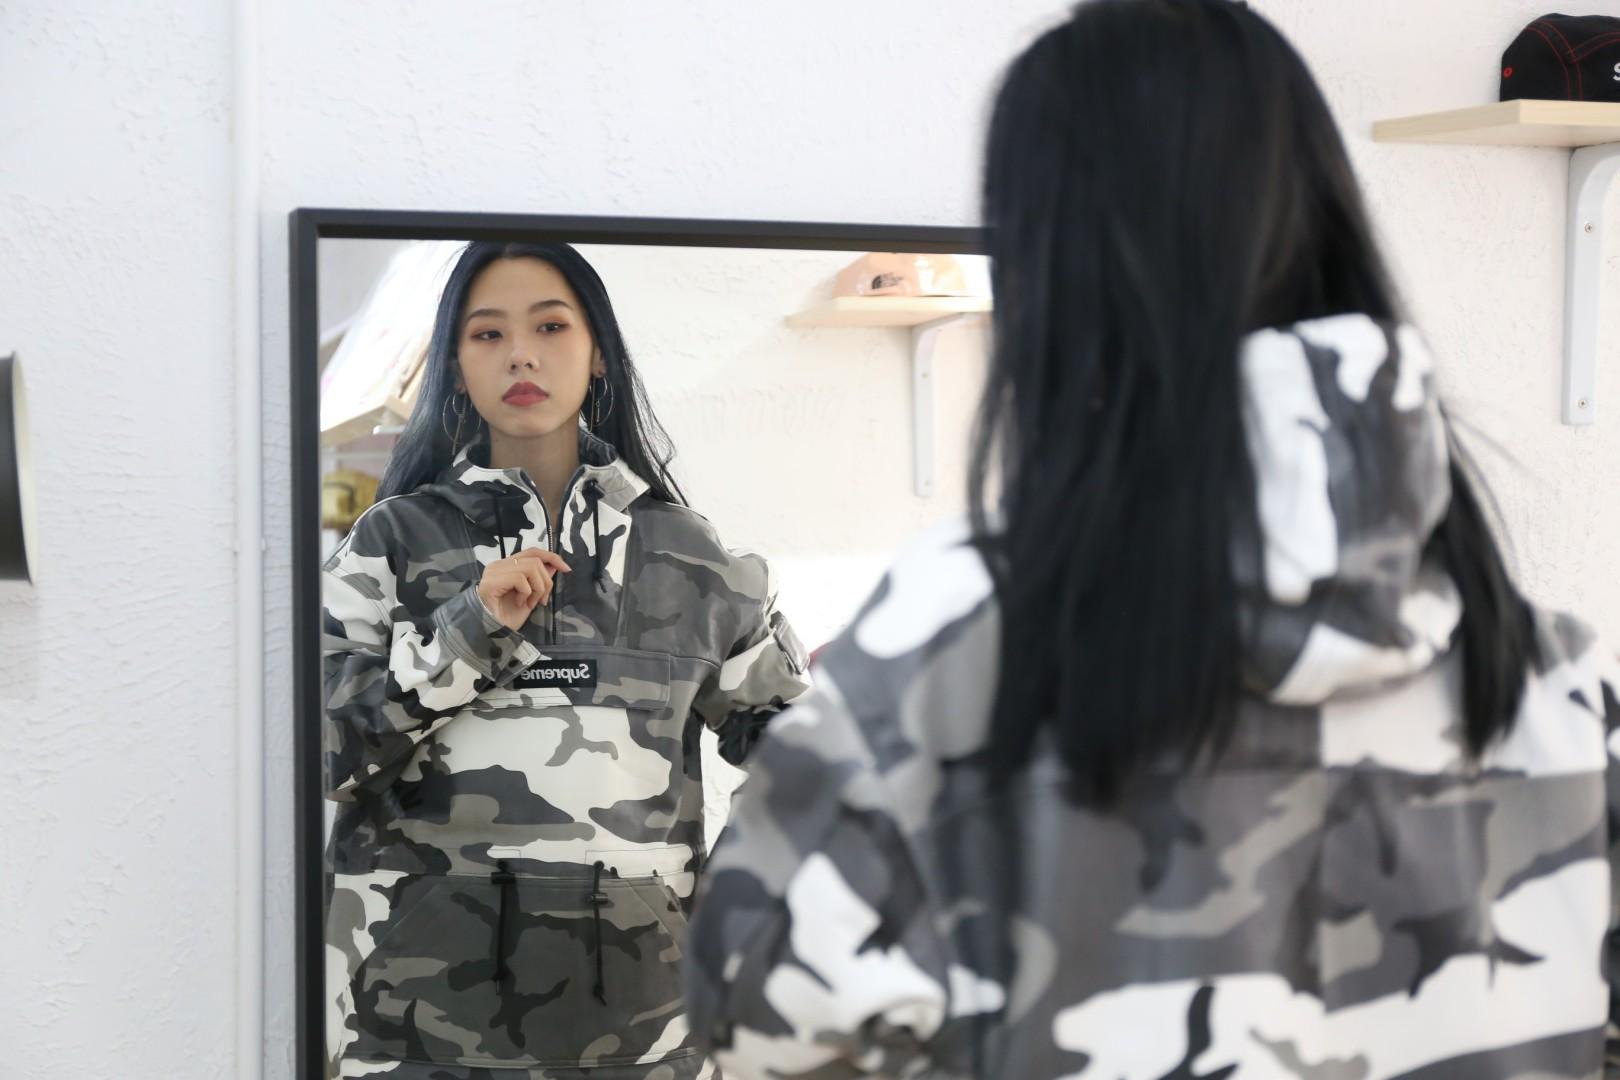 16a441aa2 Chinese millennials embrace Supreme streetwear brand